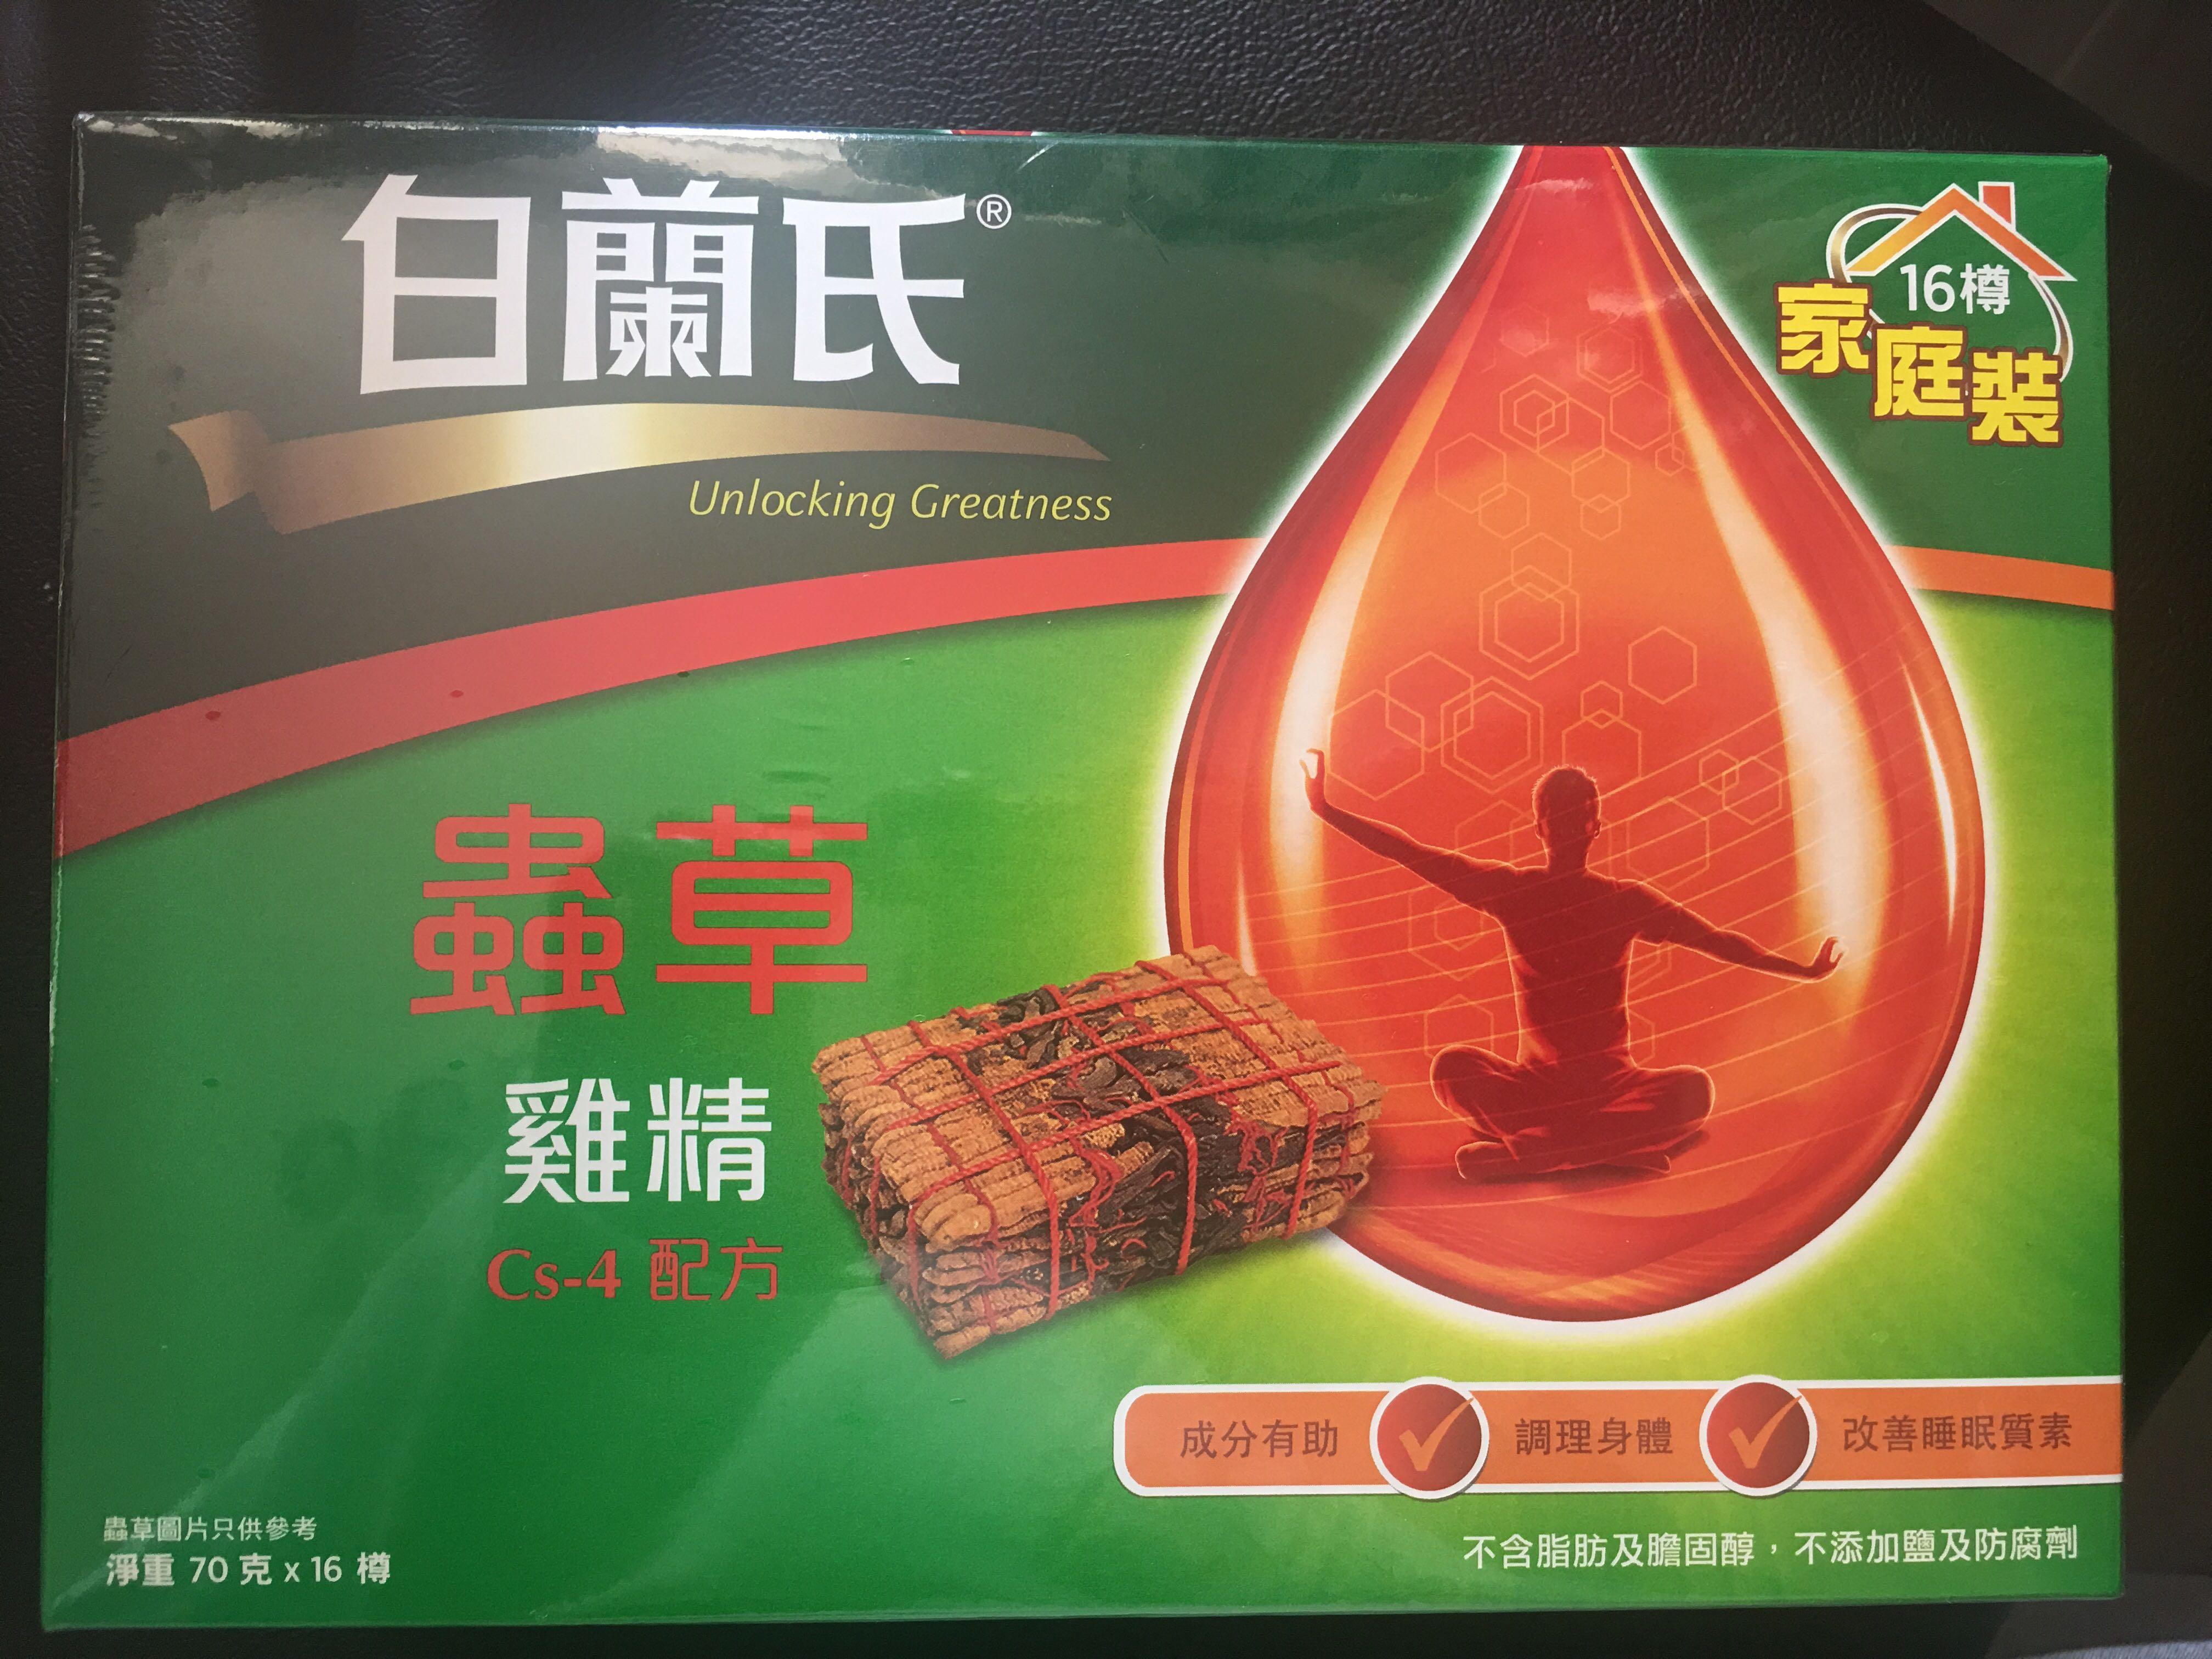 白蘭氏Brands  CS-4 蟲草雞精 Chicken Essence 家庭裝 family pack 16樽 bottles